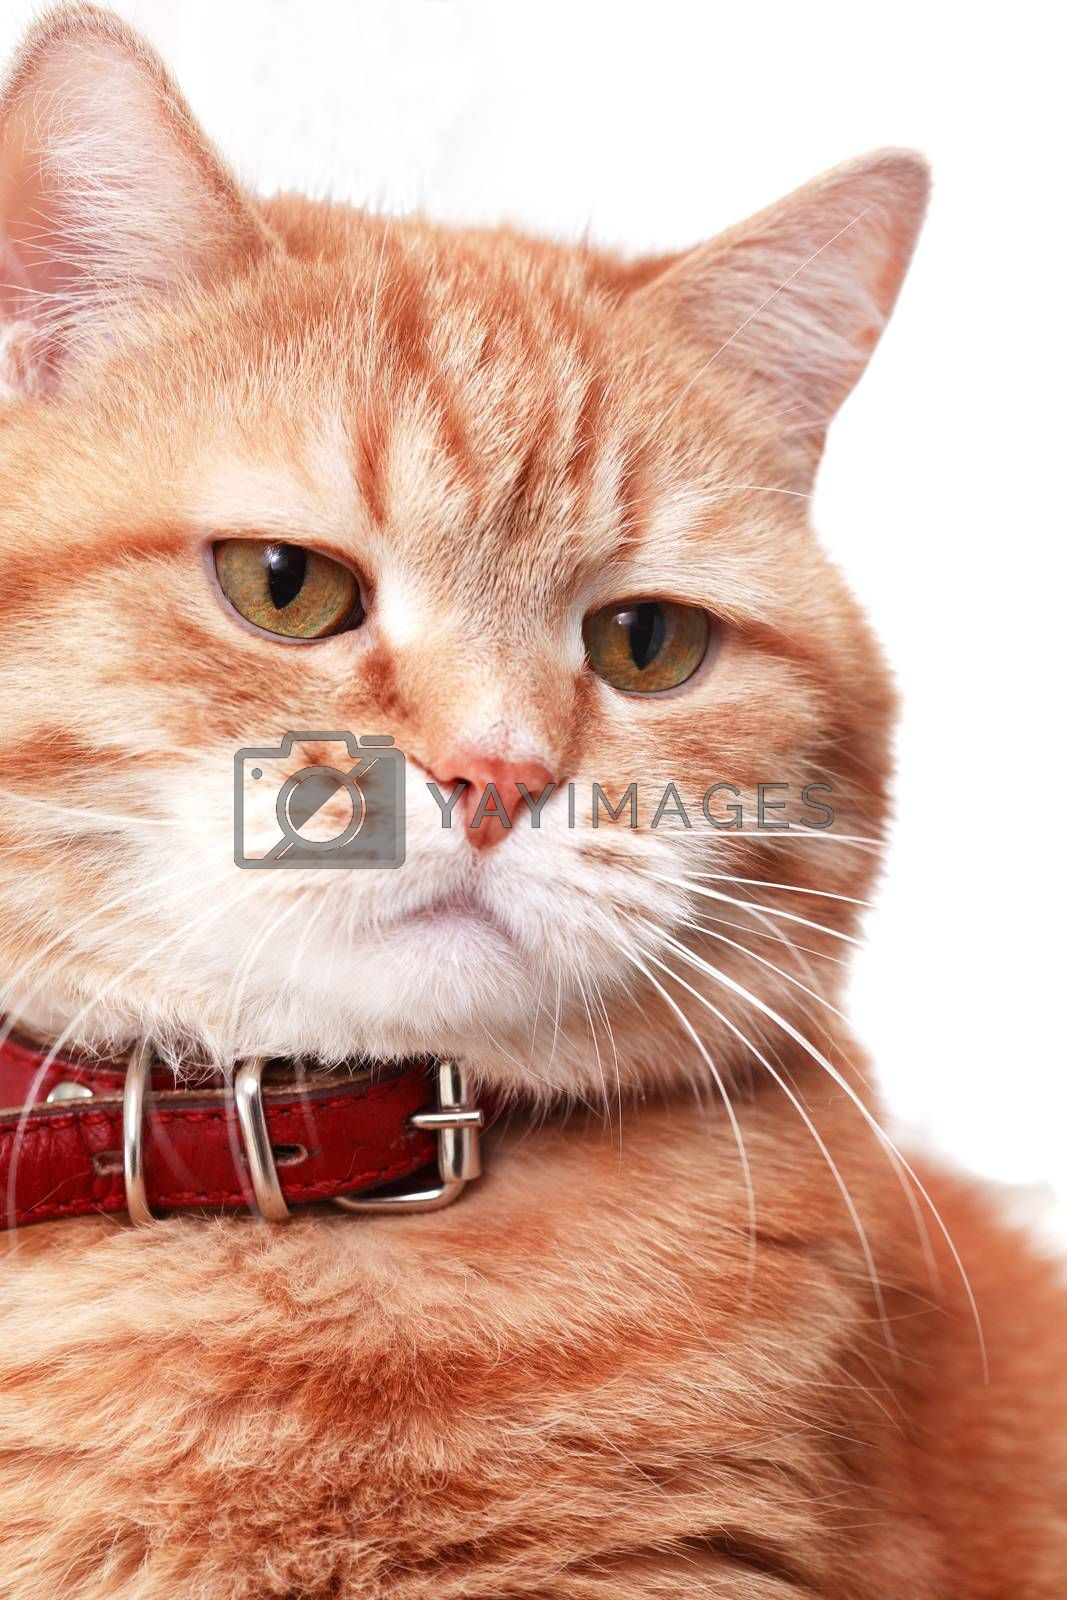 Serious Ginger Cat by kvkirillov